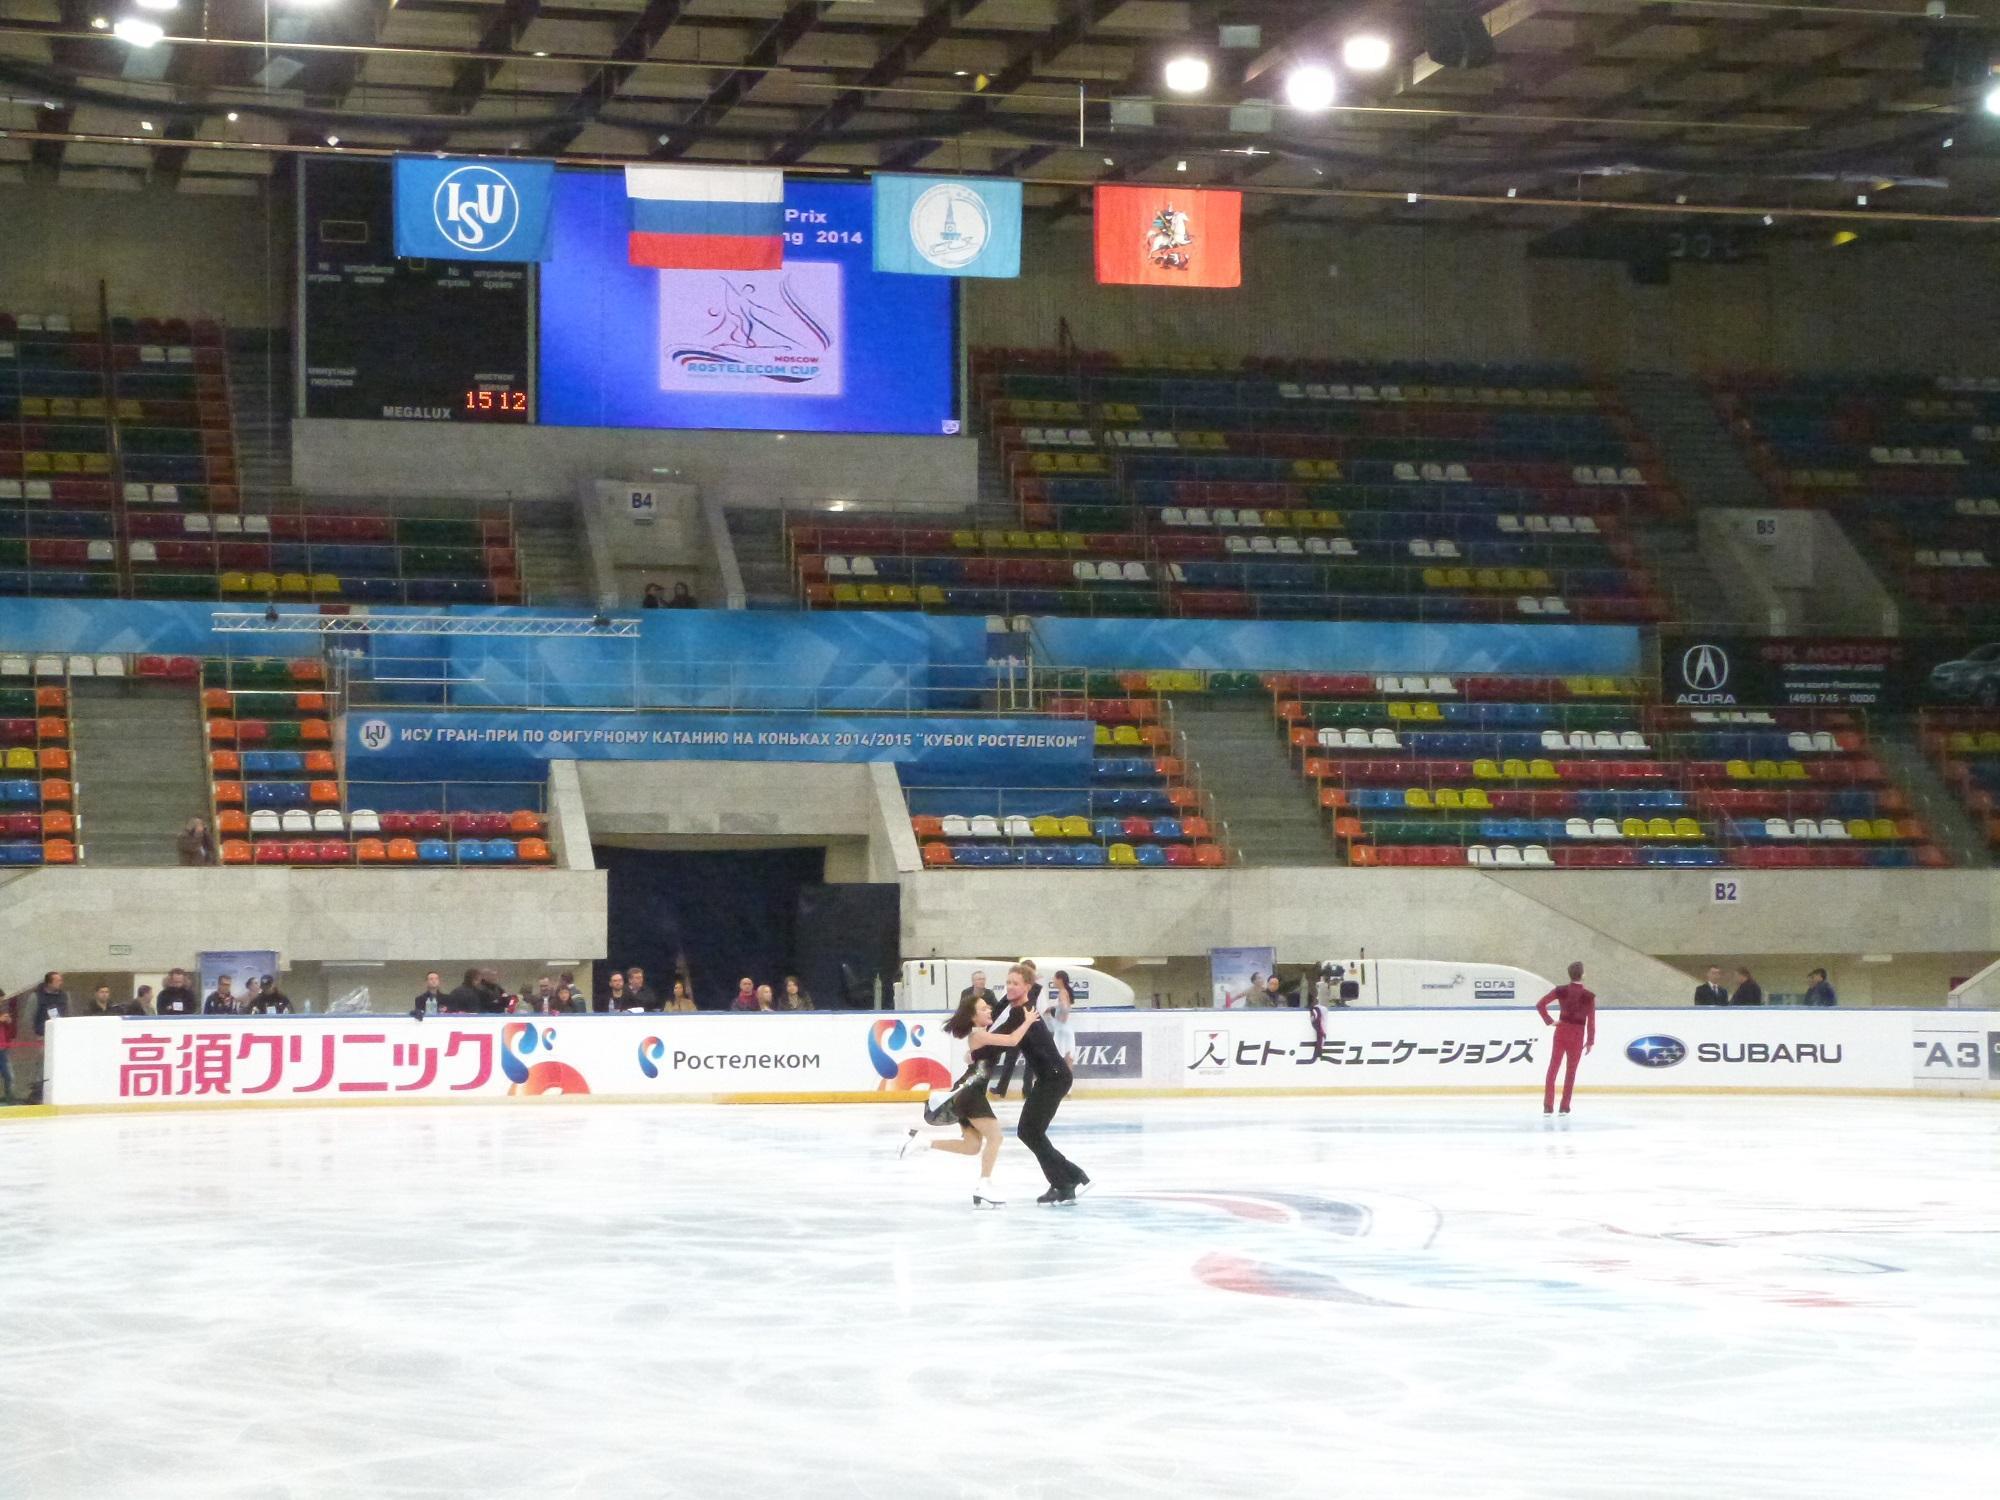 4 этап. ISU GP Rostelecom Cup 2014 14 - 16 Nov 2014 Moscow Russia-1-2 B2UjDG1CAAEDKoZ